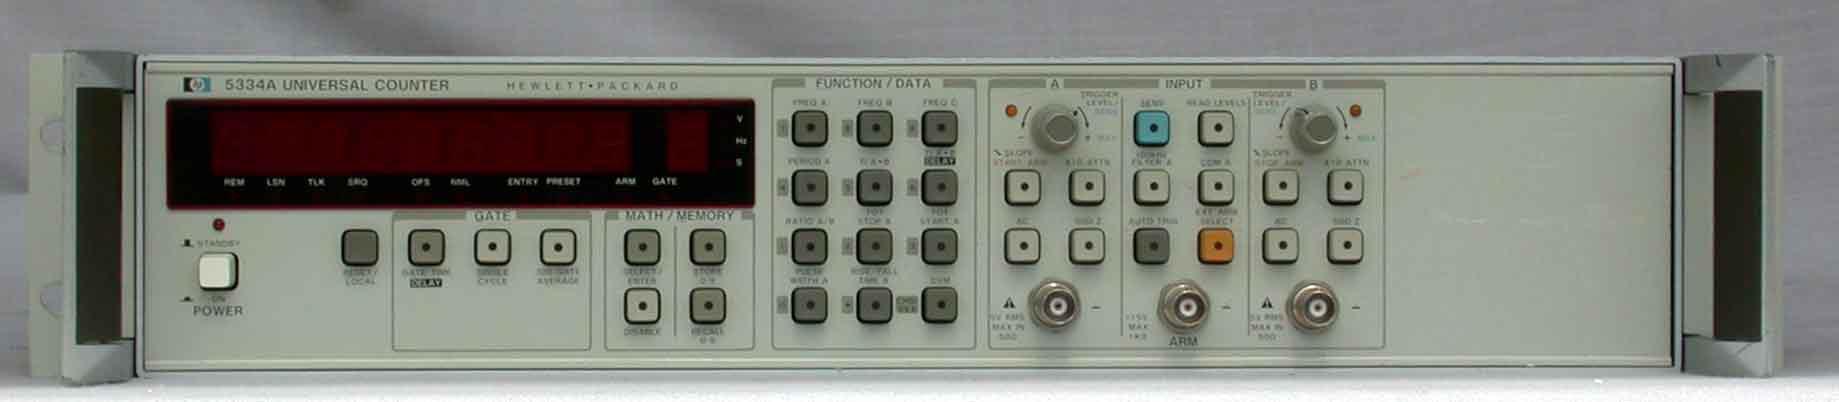 Agilent 5334A-10